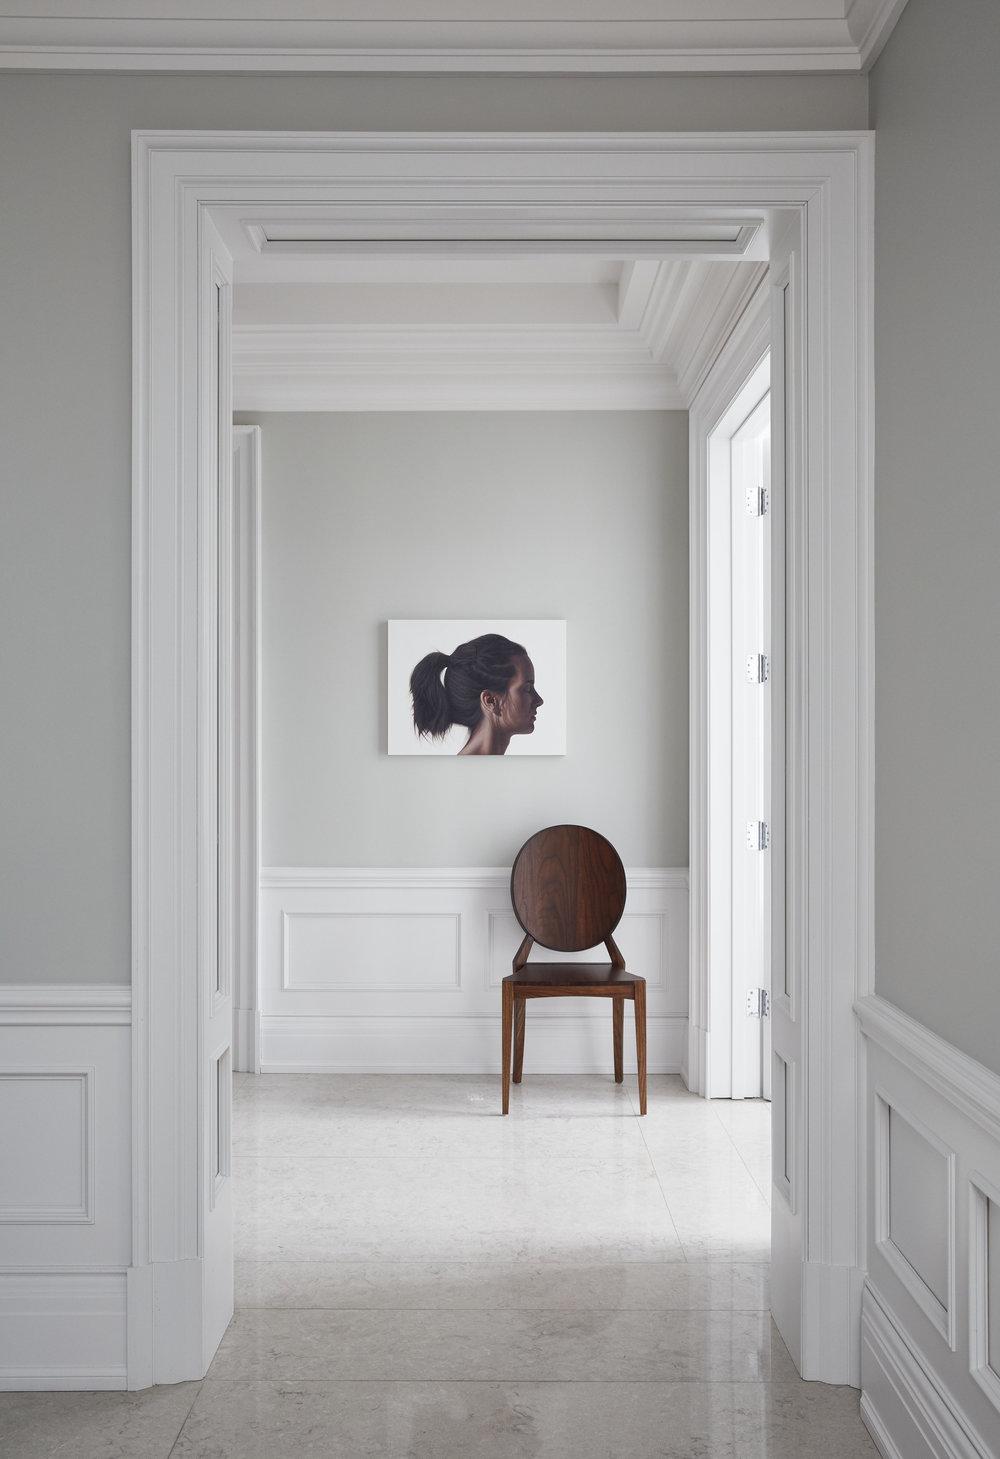 8_Hallway_Frame.jpg